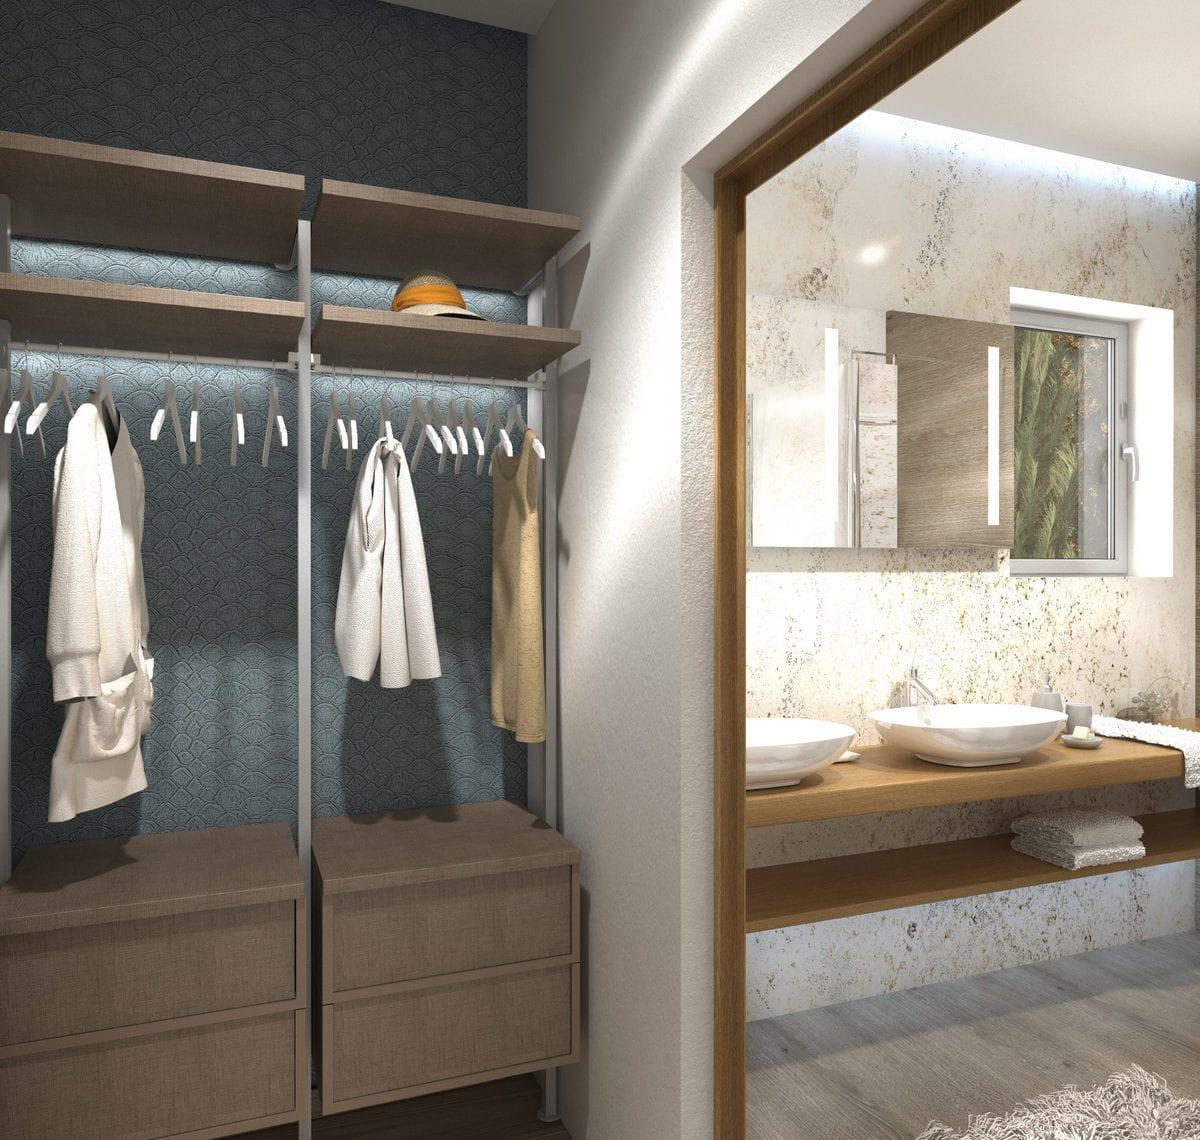 walk-in-closet bathroom